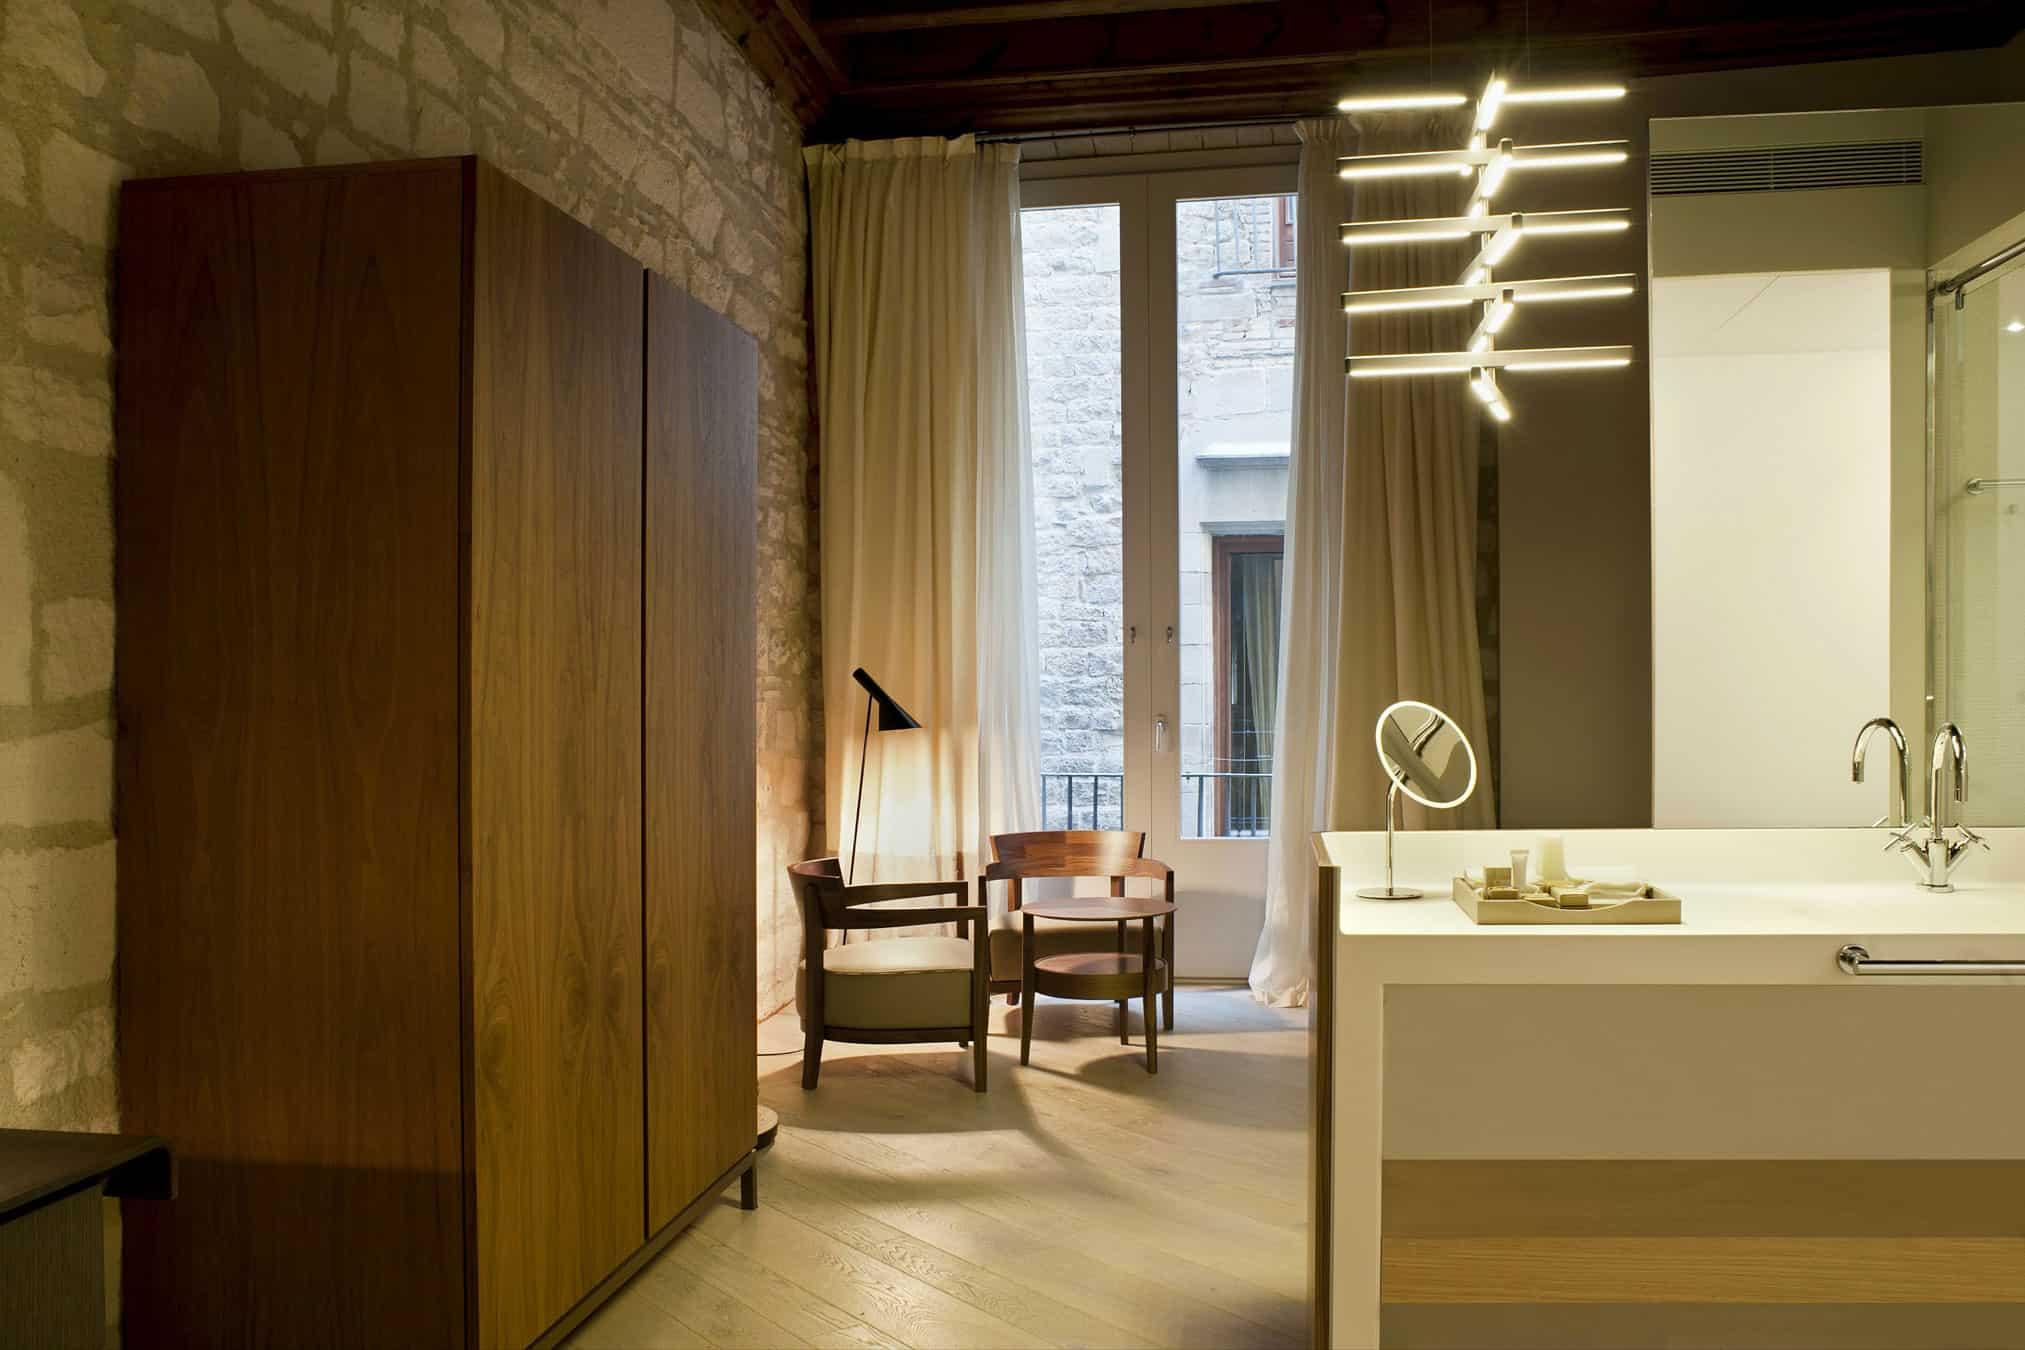 Mercer Hotel Barcelona by Rafael Moneo (29)